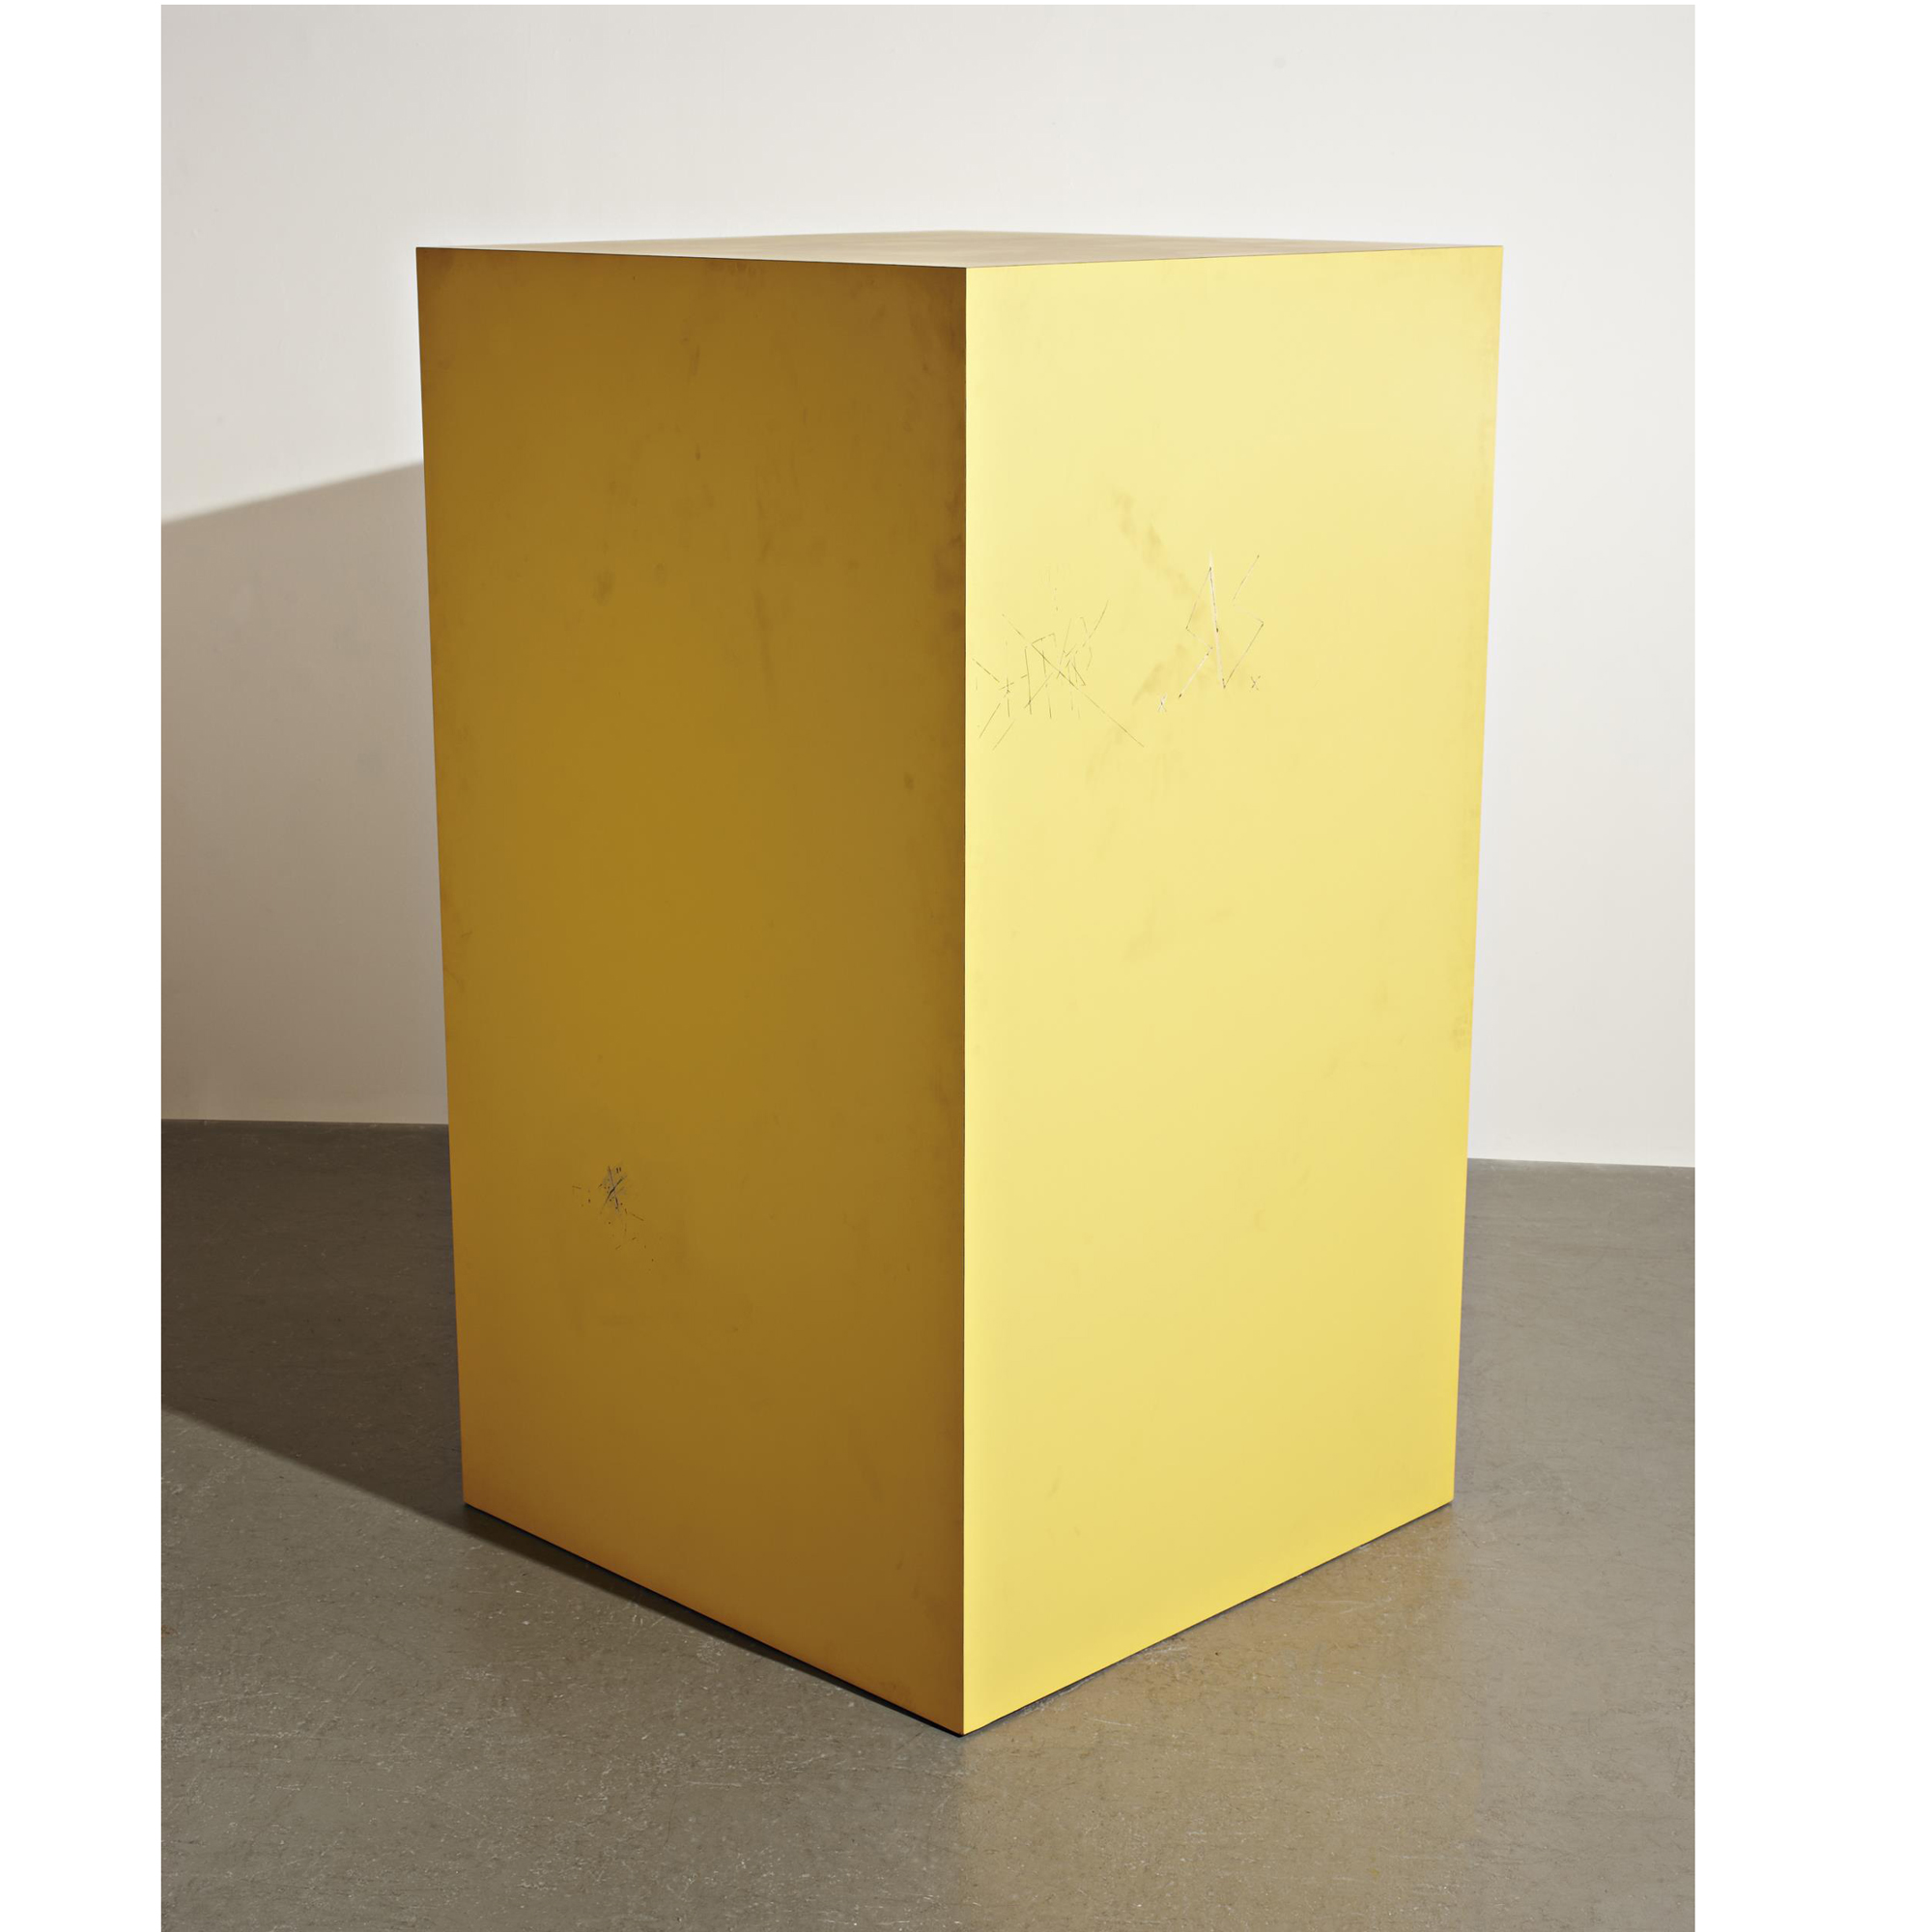 STERLING RUBY Morgan Concrete Art Advisory London MCAAL 1.jpg